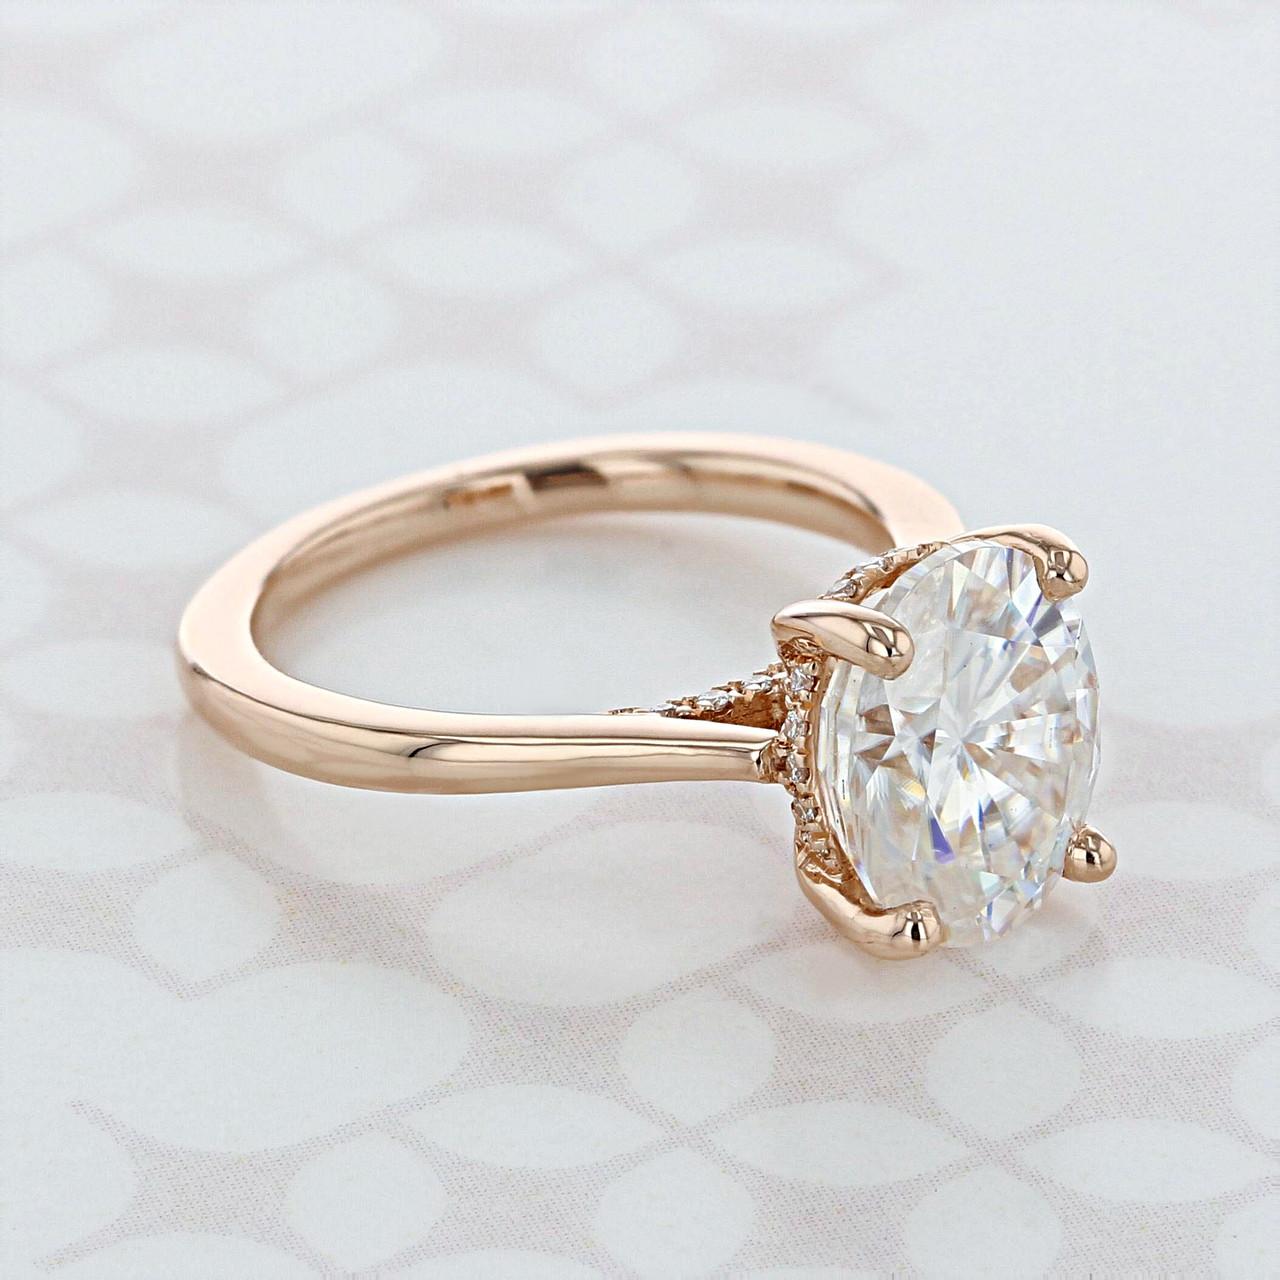 1.50 Carat Oval Cut Moissanite Hidden Halo Engagement Ring 14k Rose Gold Over